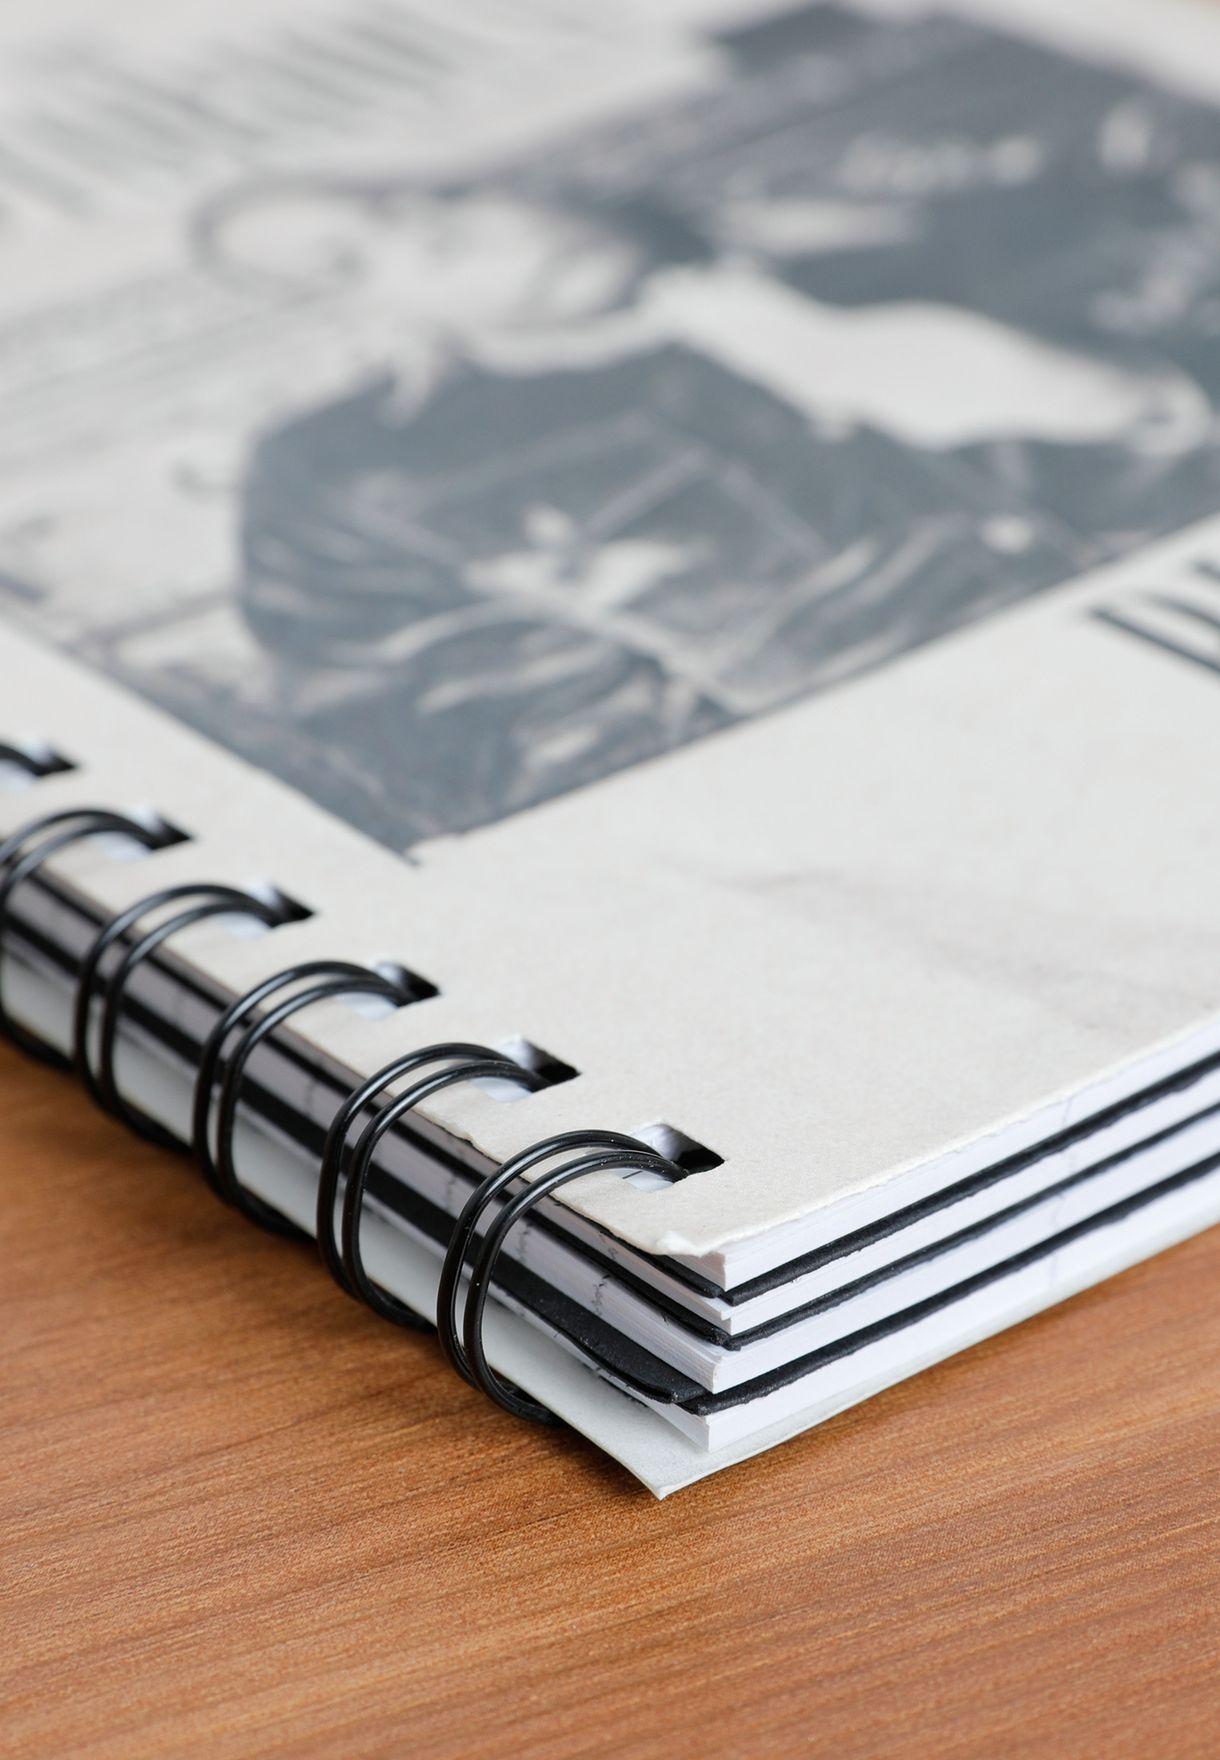 دفتر ملاحظات A5 مطبع